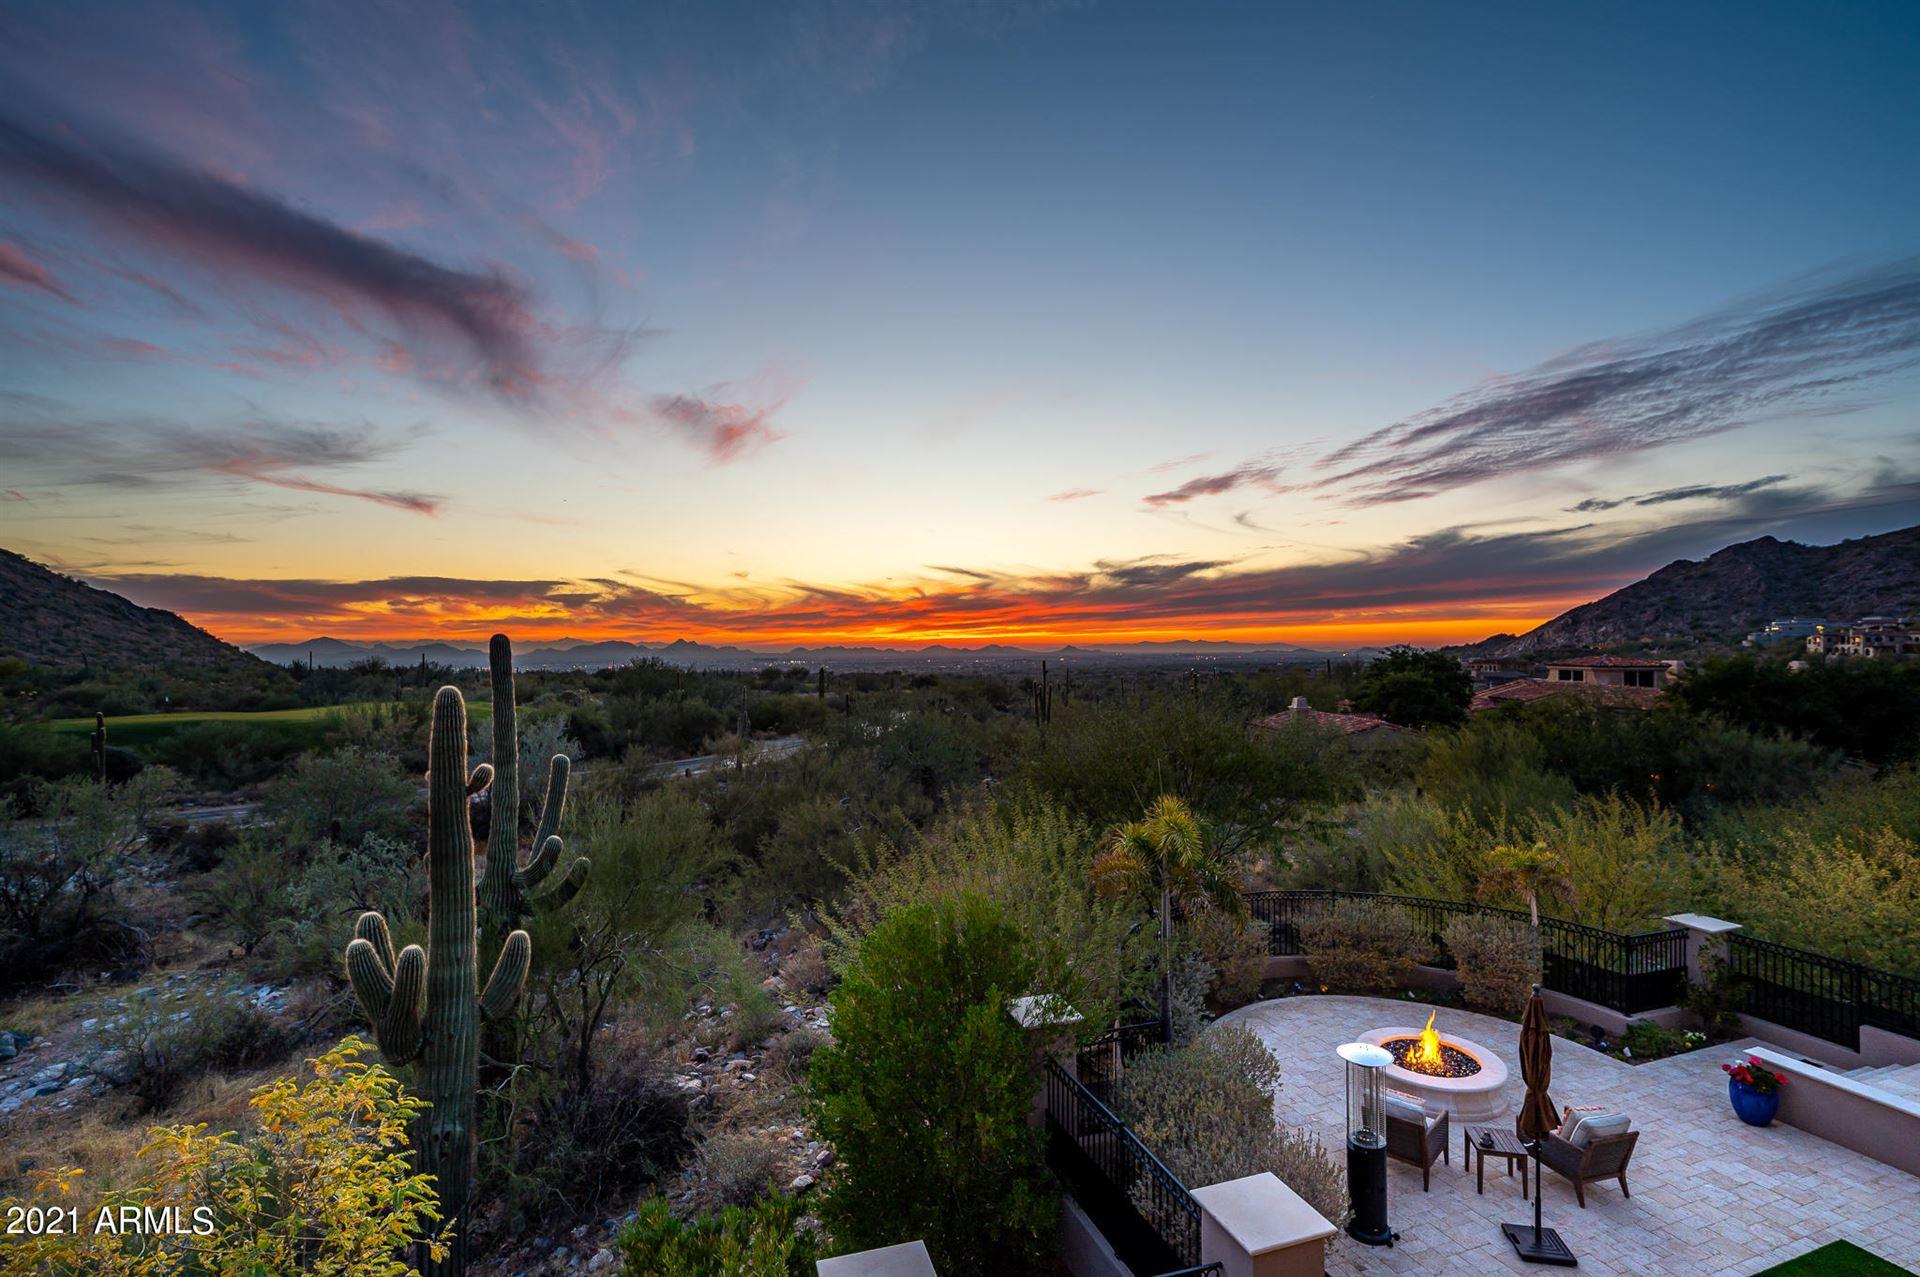 Photo of 10625 E WINGSPAN Way, Scottsdale, AZ 85255 (MLS # 6181865)